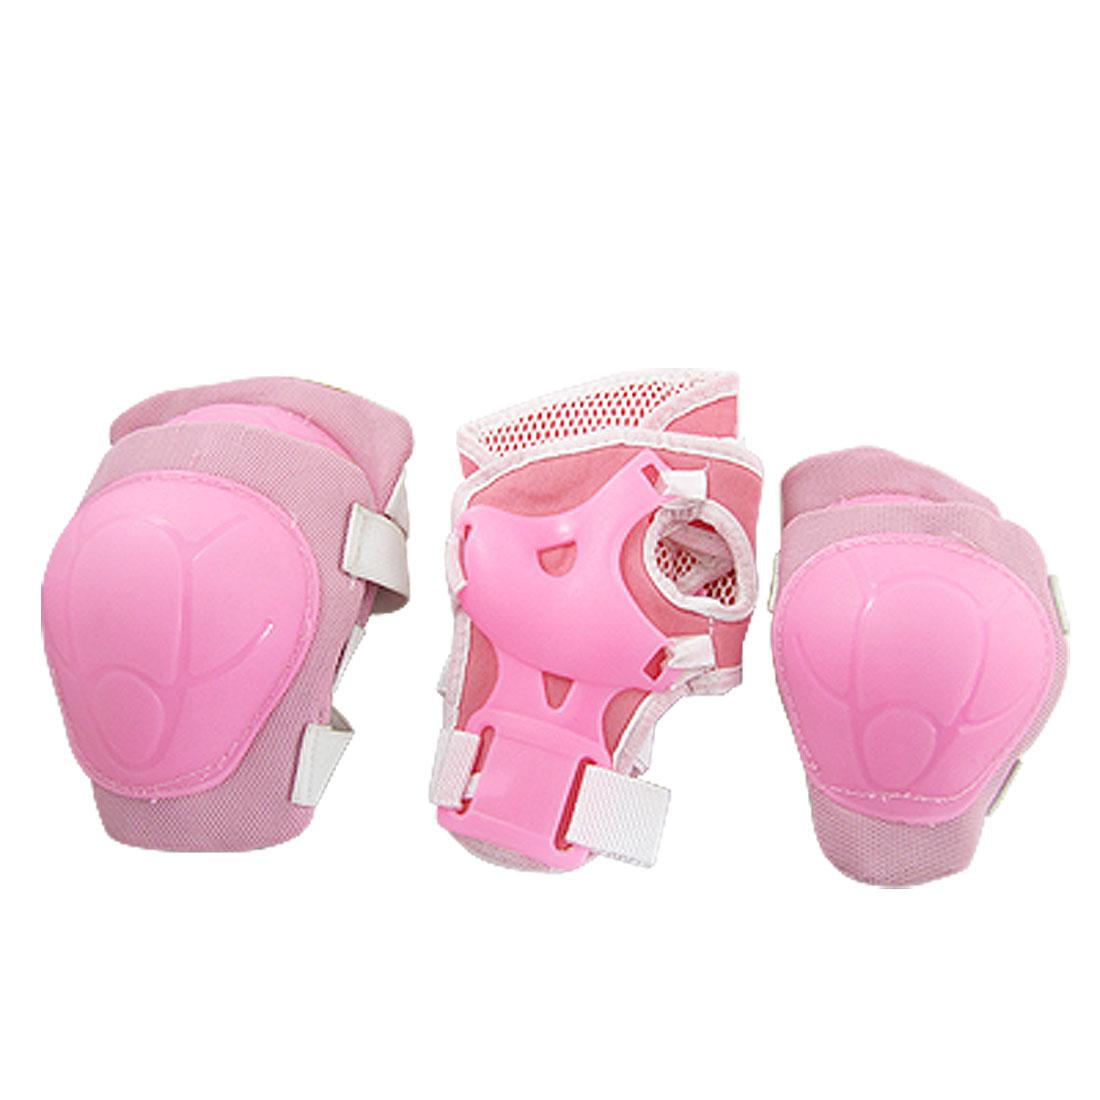 Children Pink Wrist Elbow Knee Pad Sports Support Set